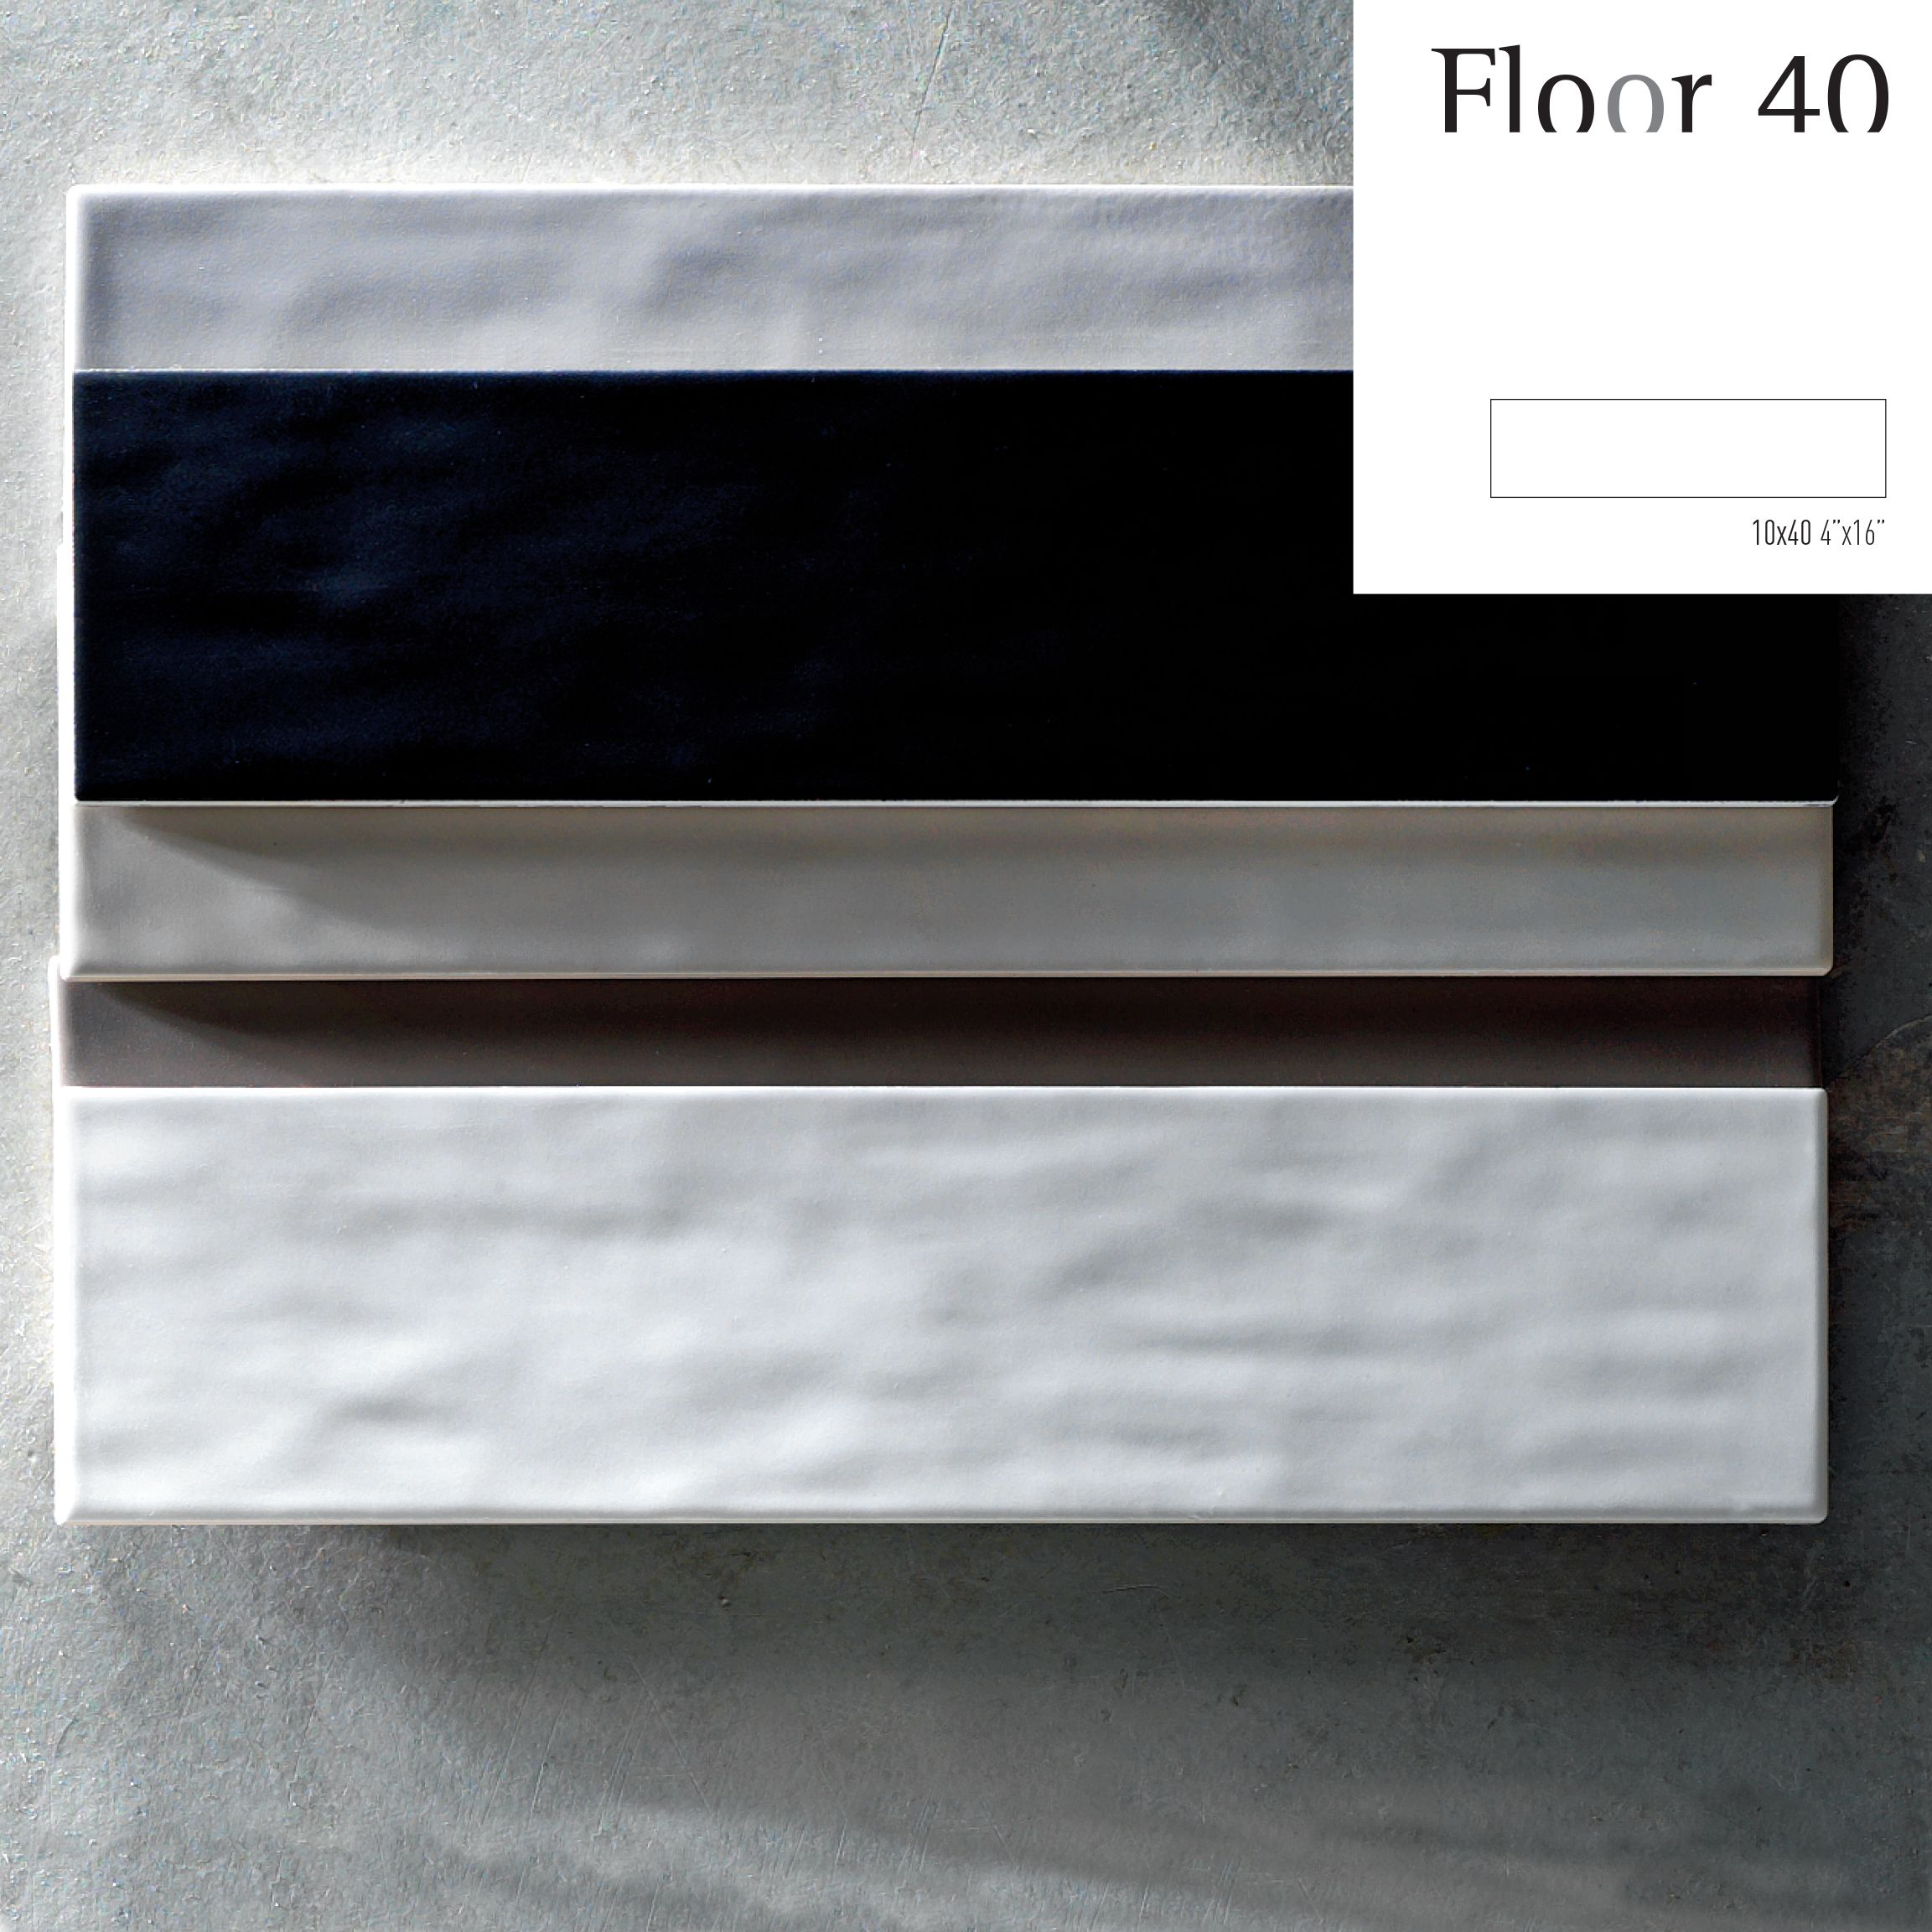 Tonalite collezione Floor 40, 10x40, 7 colori matt. Tiles ...